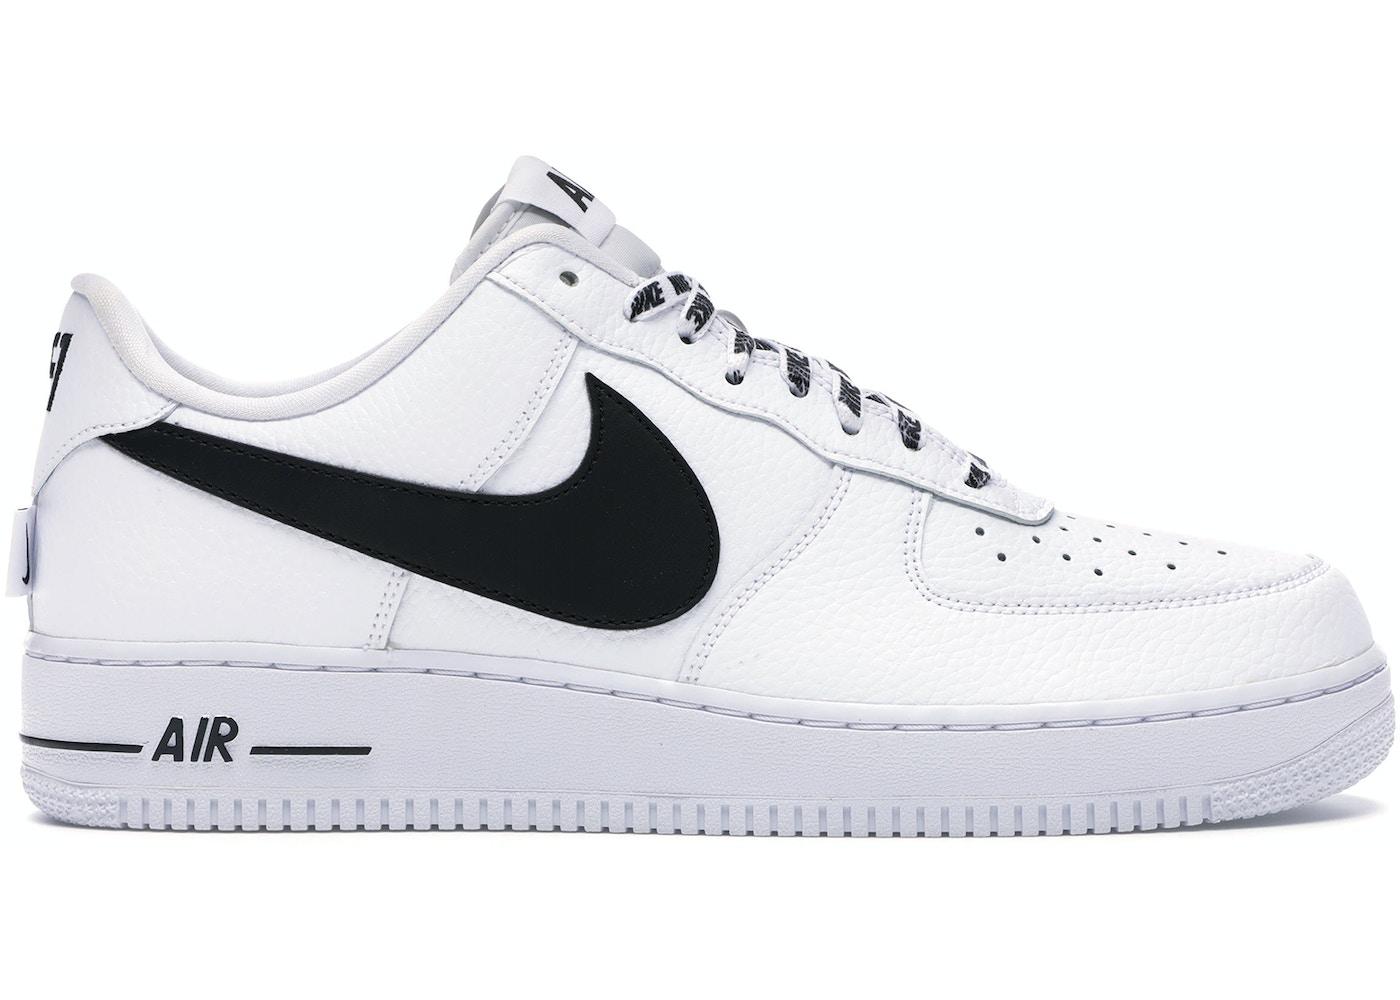 Nike Air Force 1 Low Nba White Black 823511 103